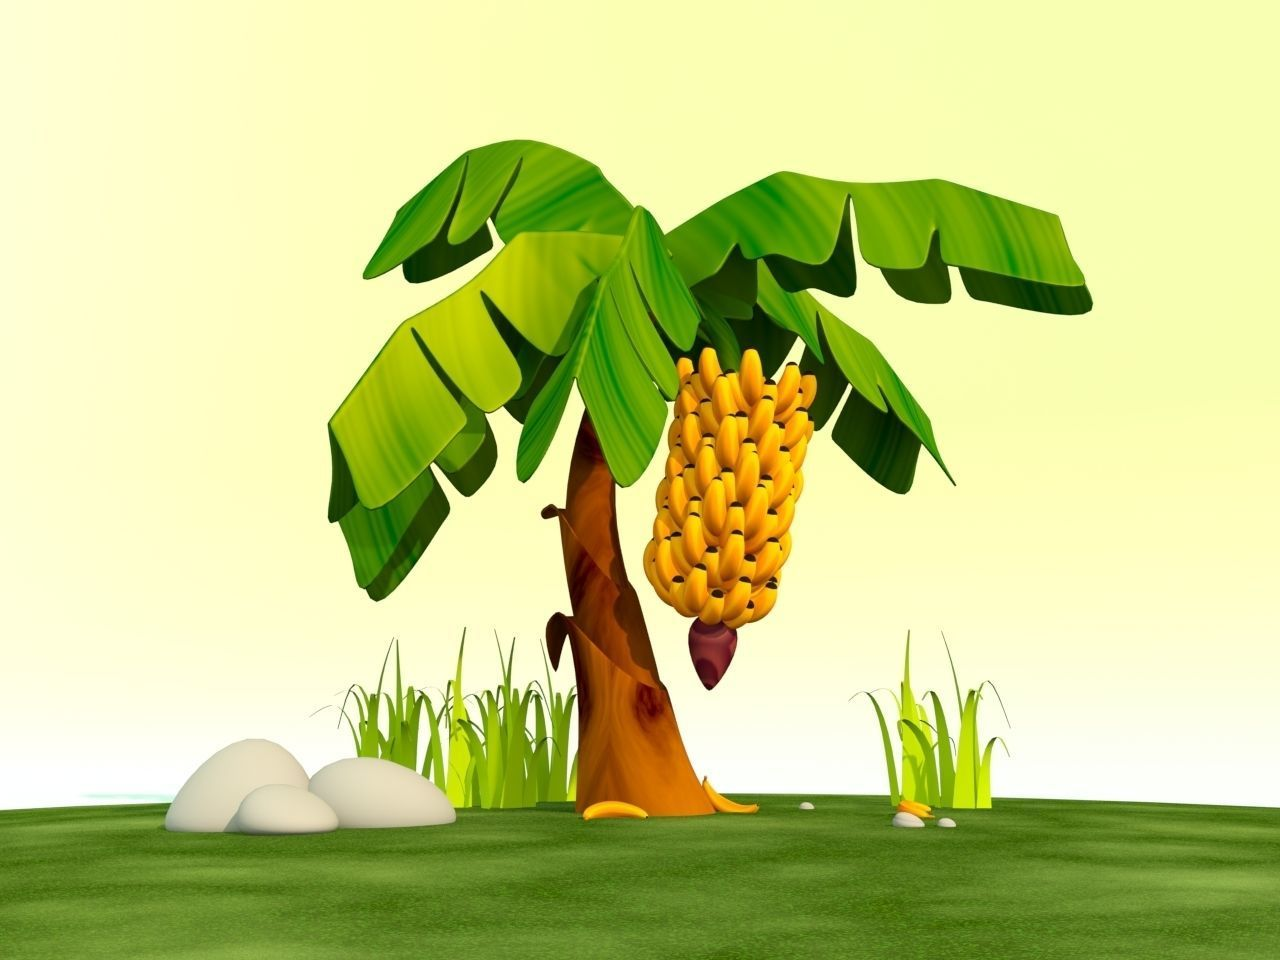 Cartoon Banana Tree 3d Model Cgtrader We offers cute banana cartoon products. cartoon banana tree 3d model